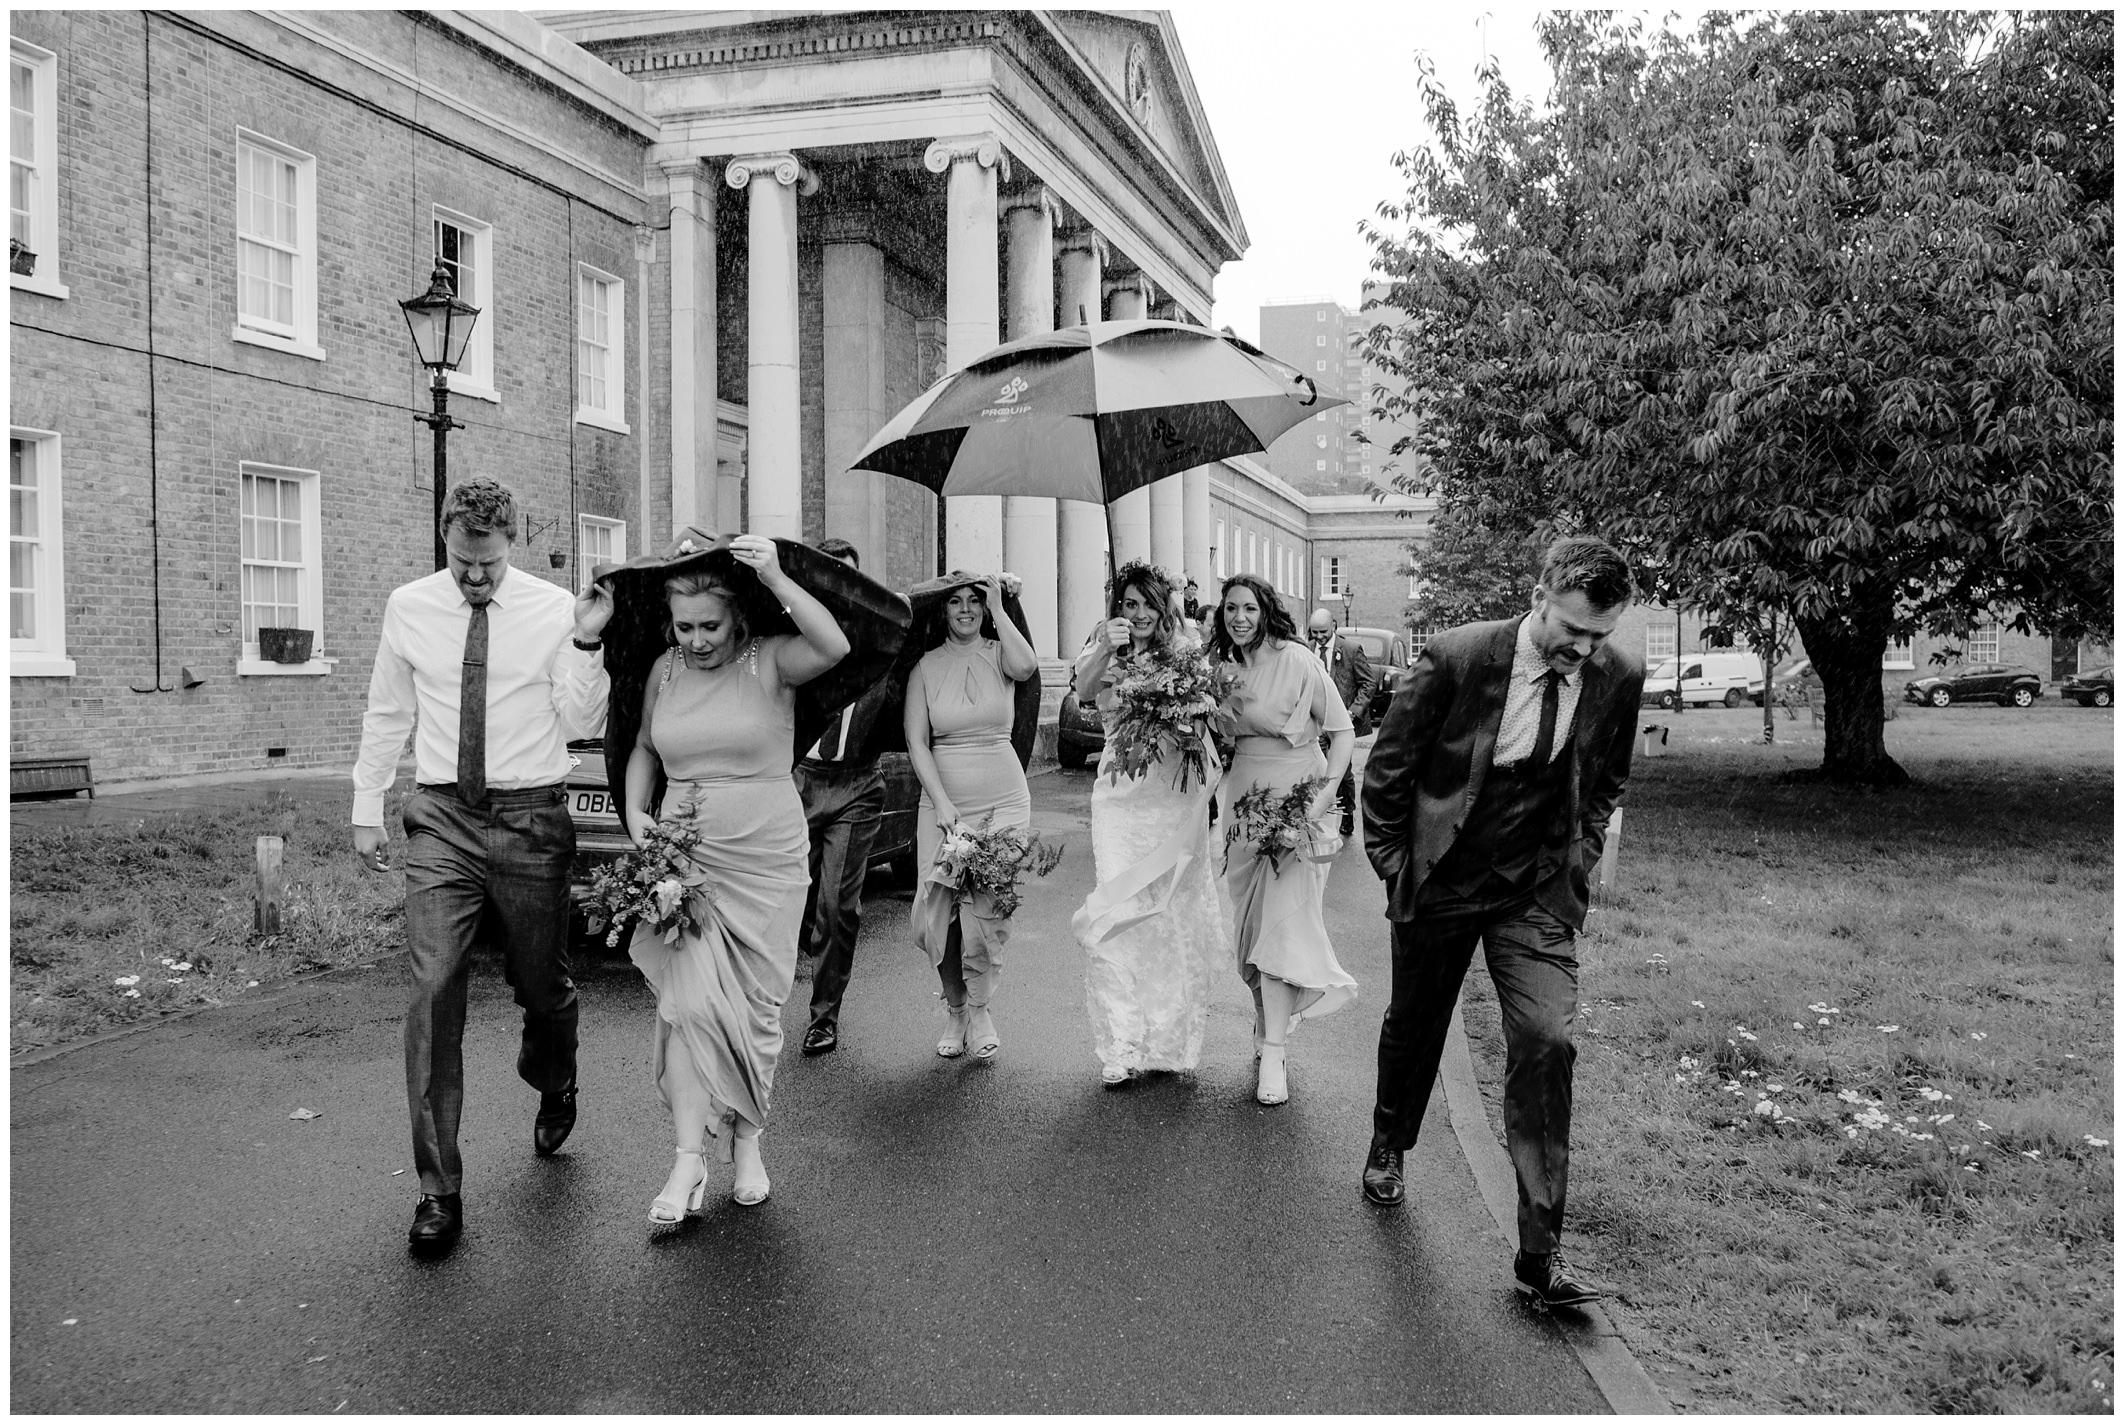 asylum_chapel_peckham_rosendale_wedding_jude_browne_photography_0120.jpg